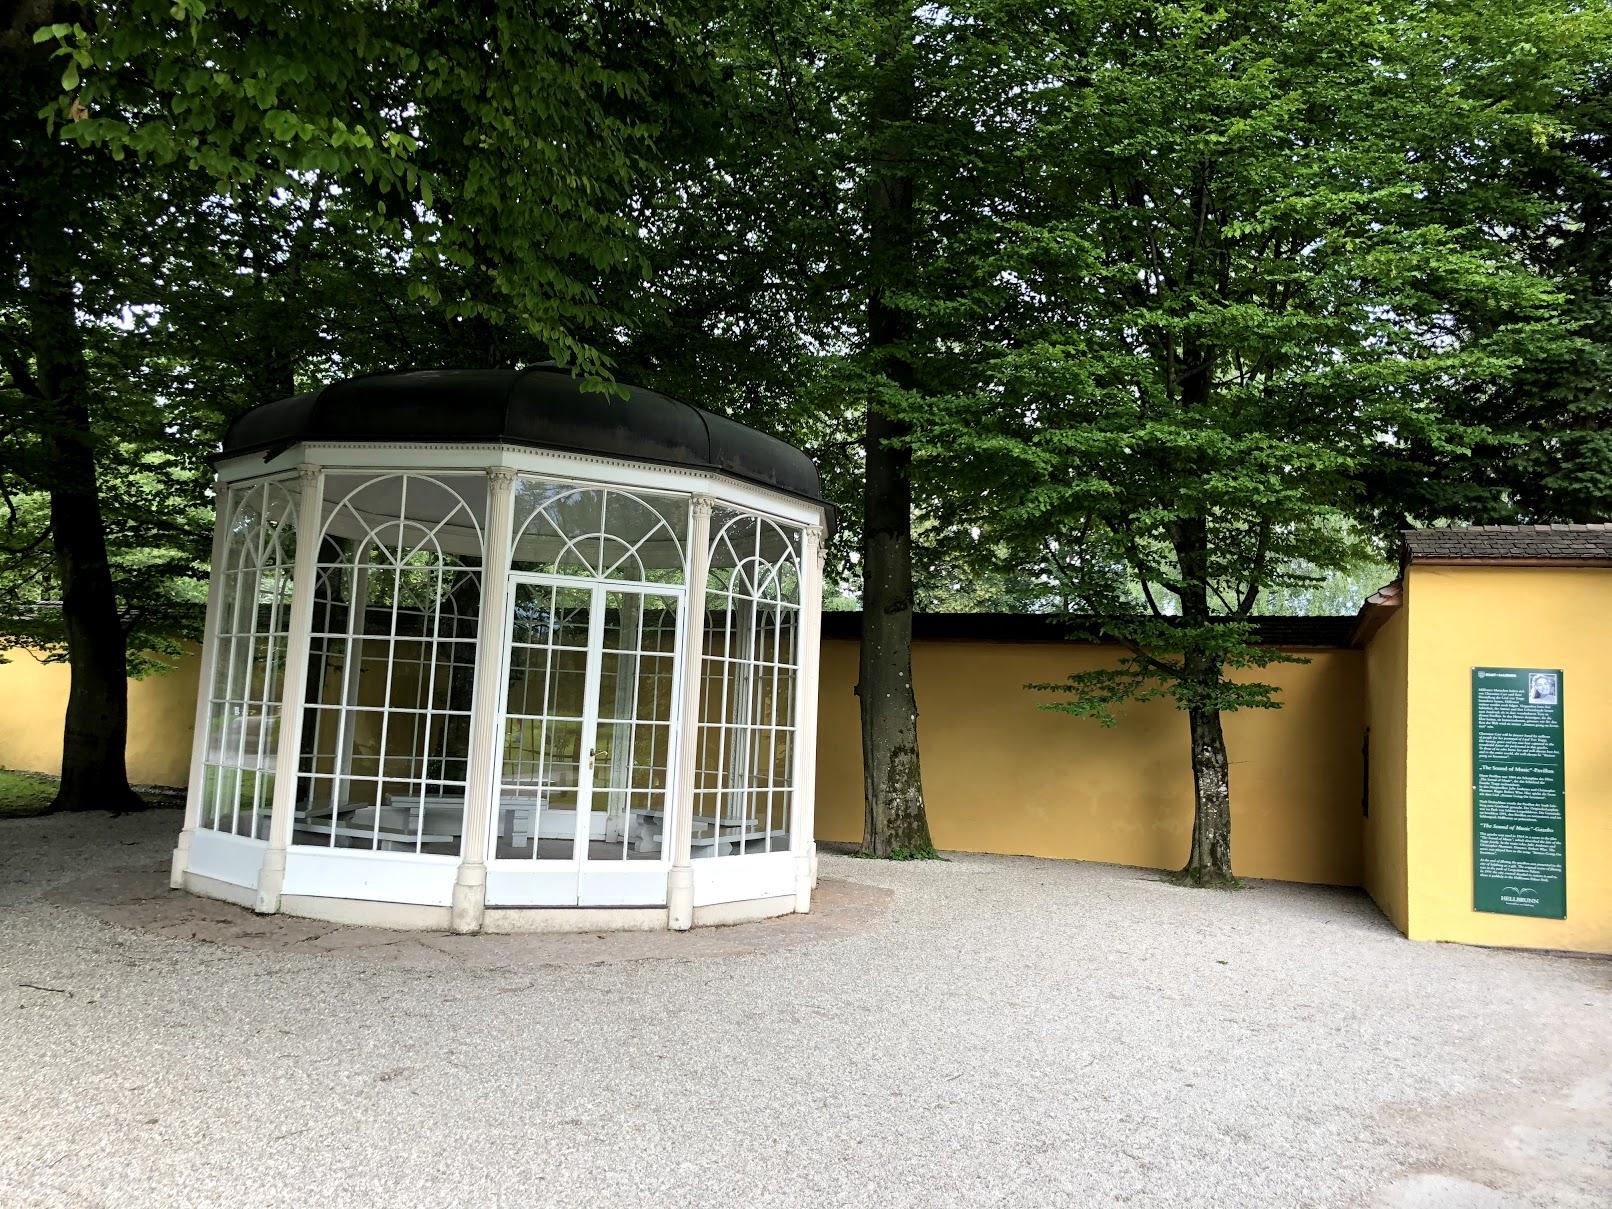 Gazebo from the Sound of Music in Salzburg